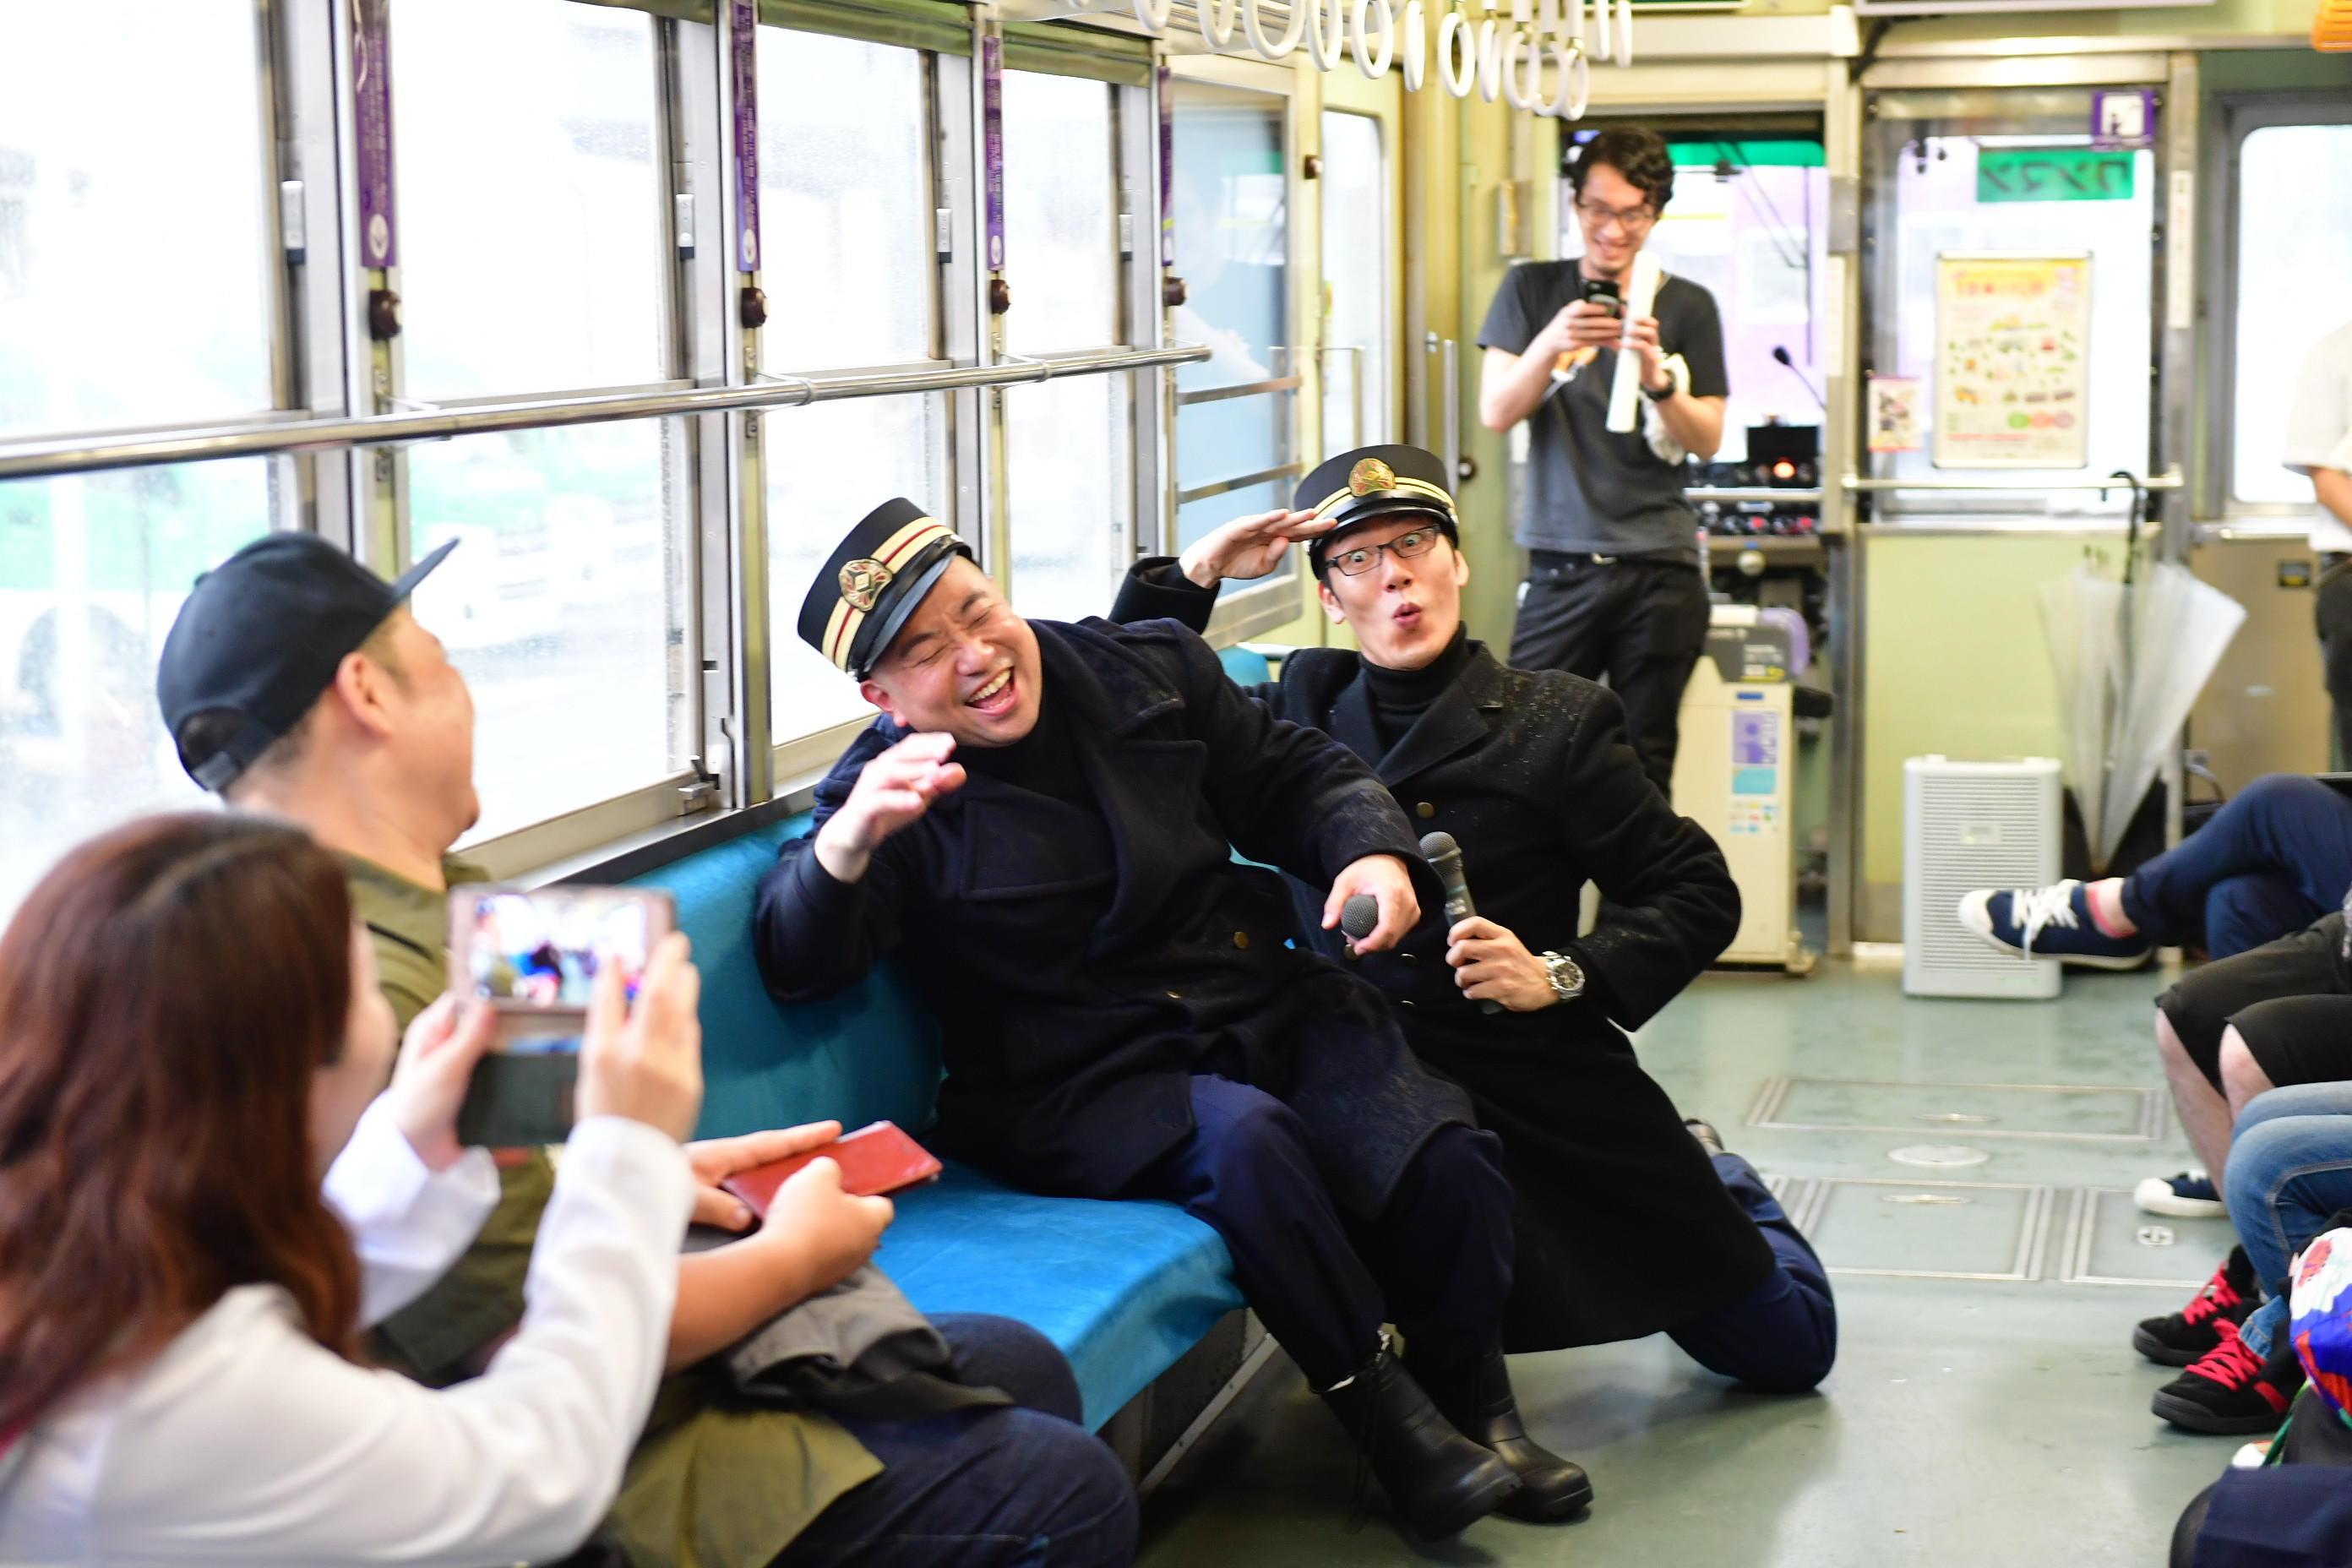 http://news.yoshimoto.co.jp/20180706214507-37e82e20832d6e7a53d3bdbed6a61bf2881aaff0.jpg